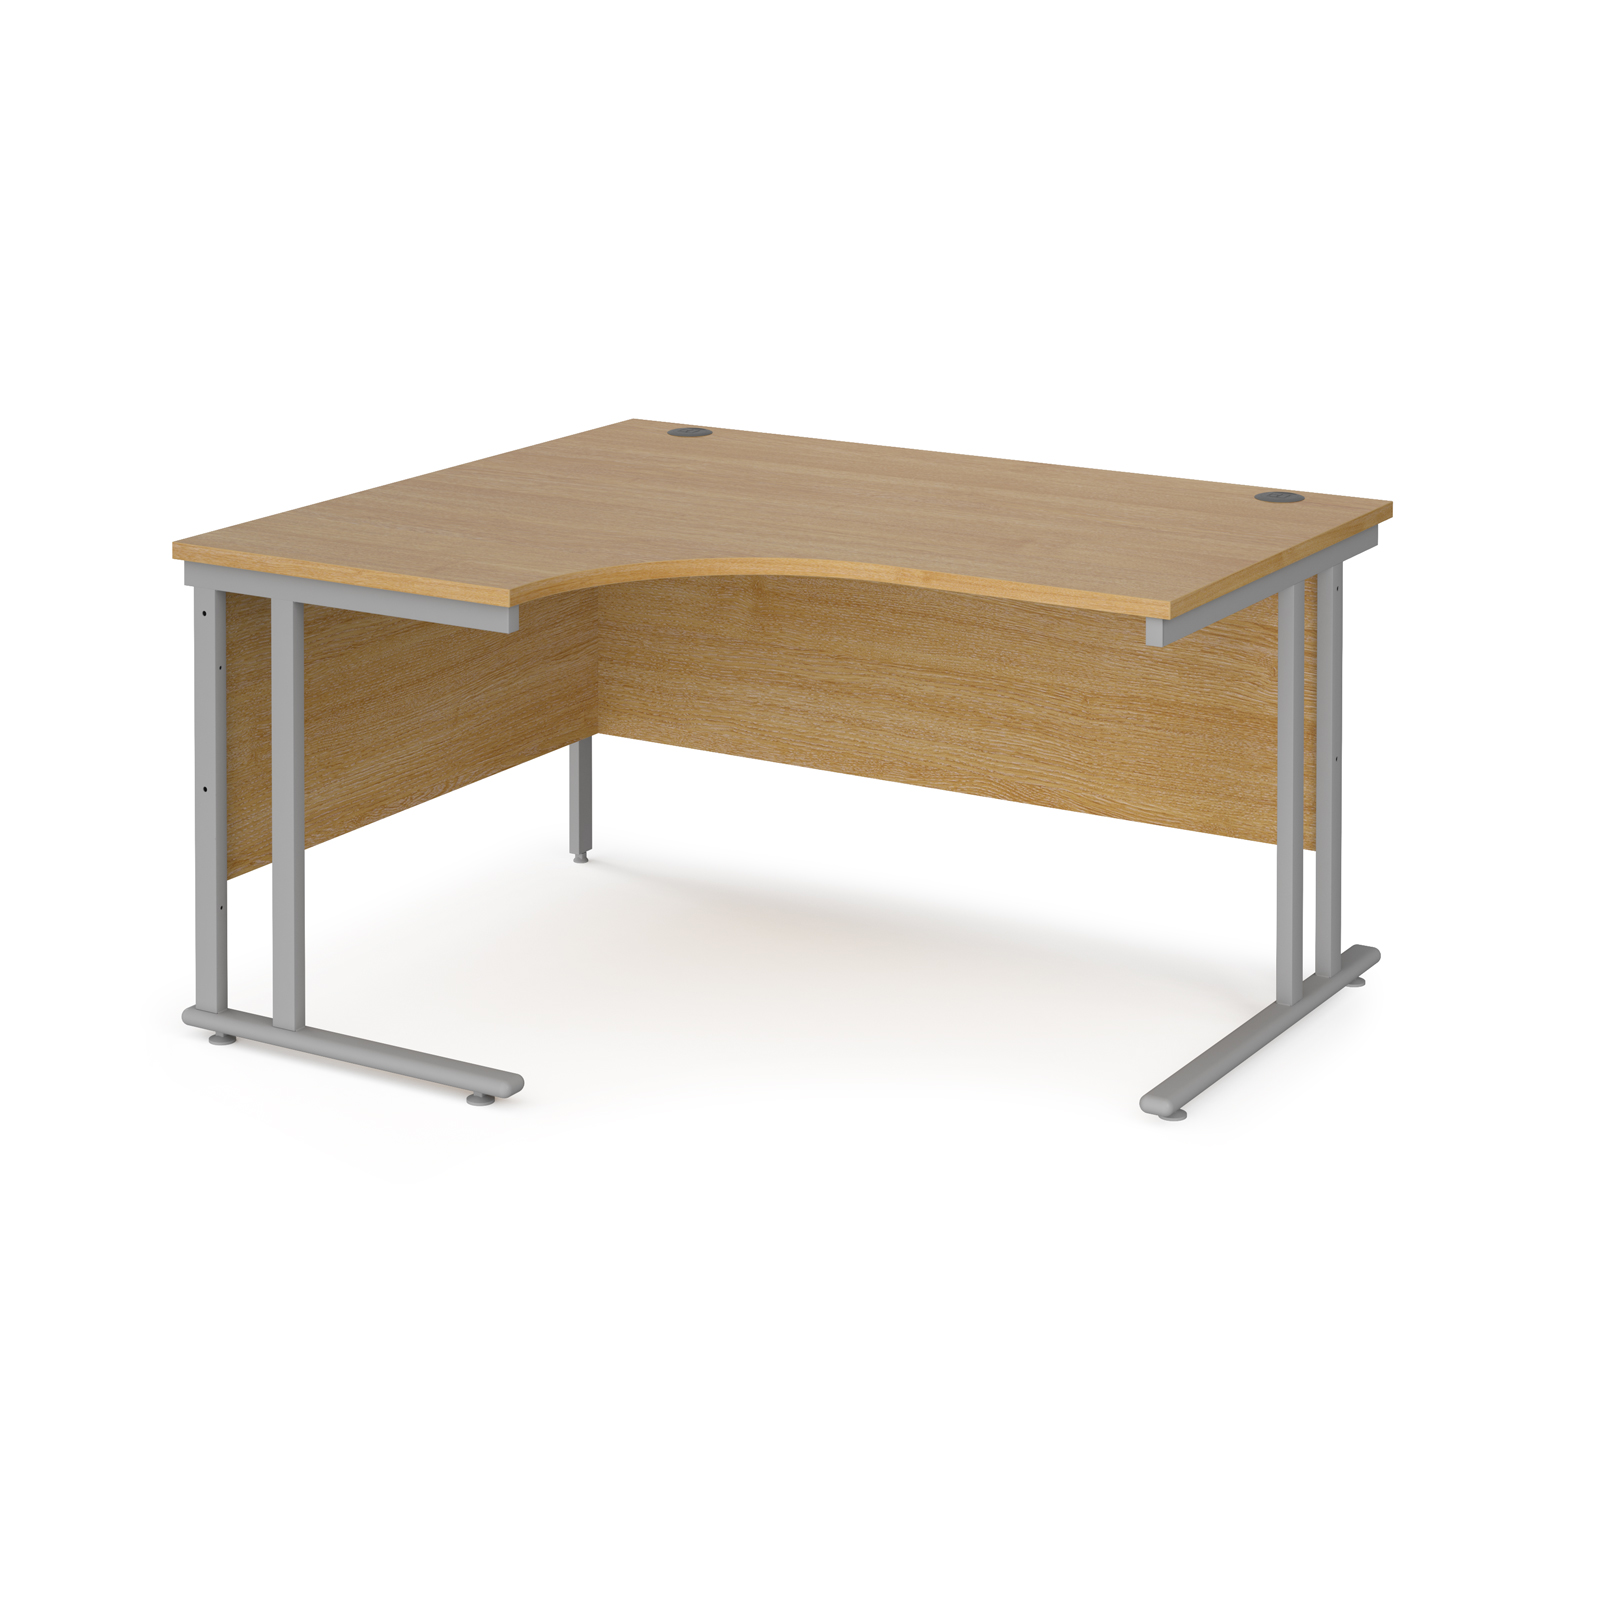 Left Handed Maestro 25 left hand ergonomic desk 1400mm wide - silver cantilever leg frame, oak top